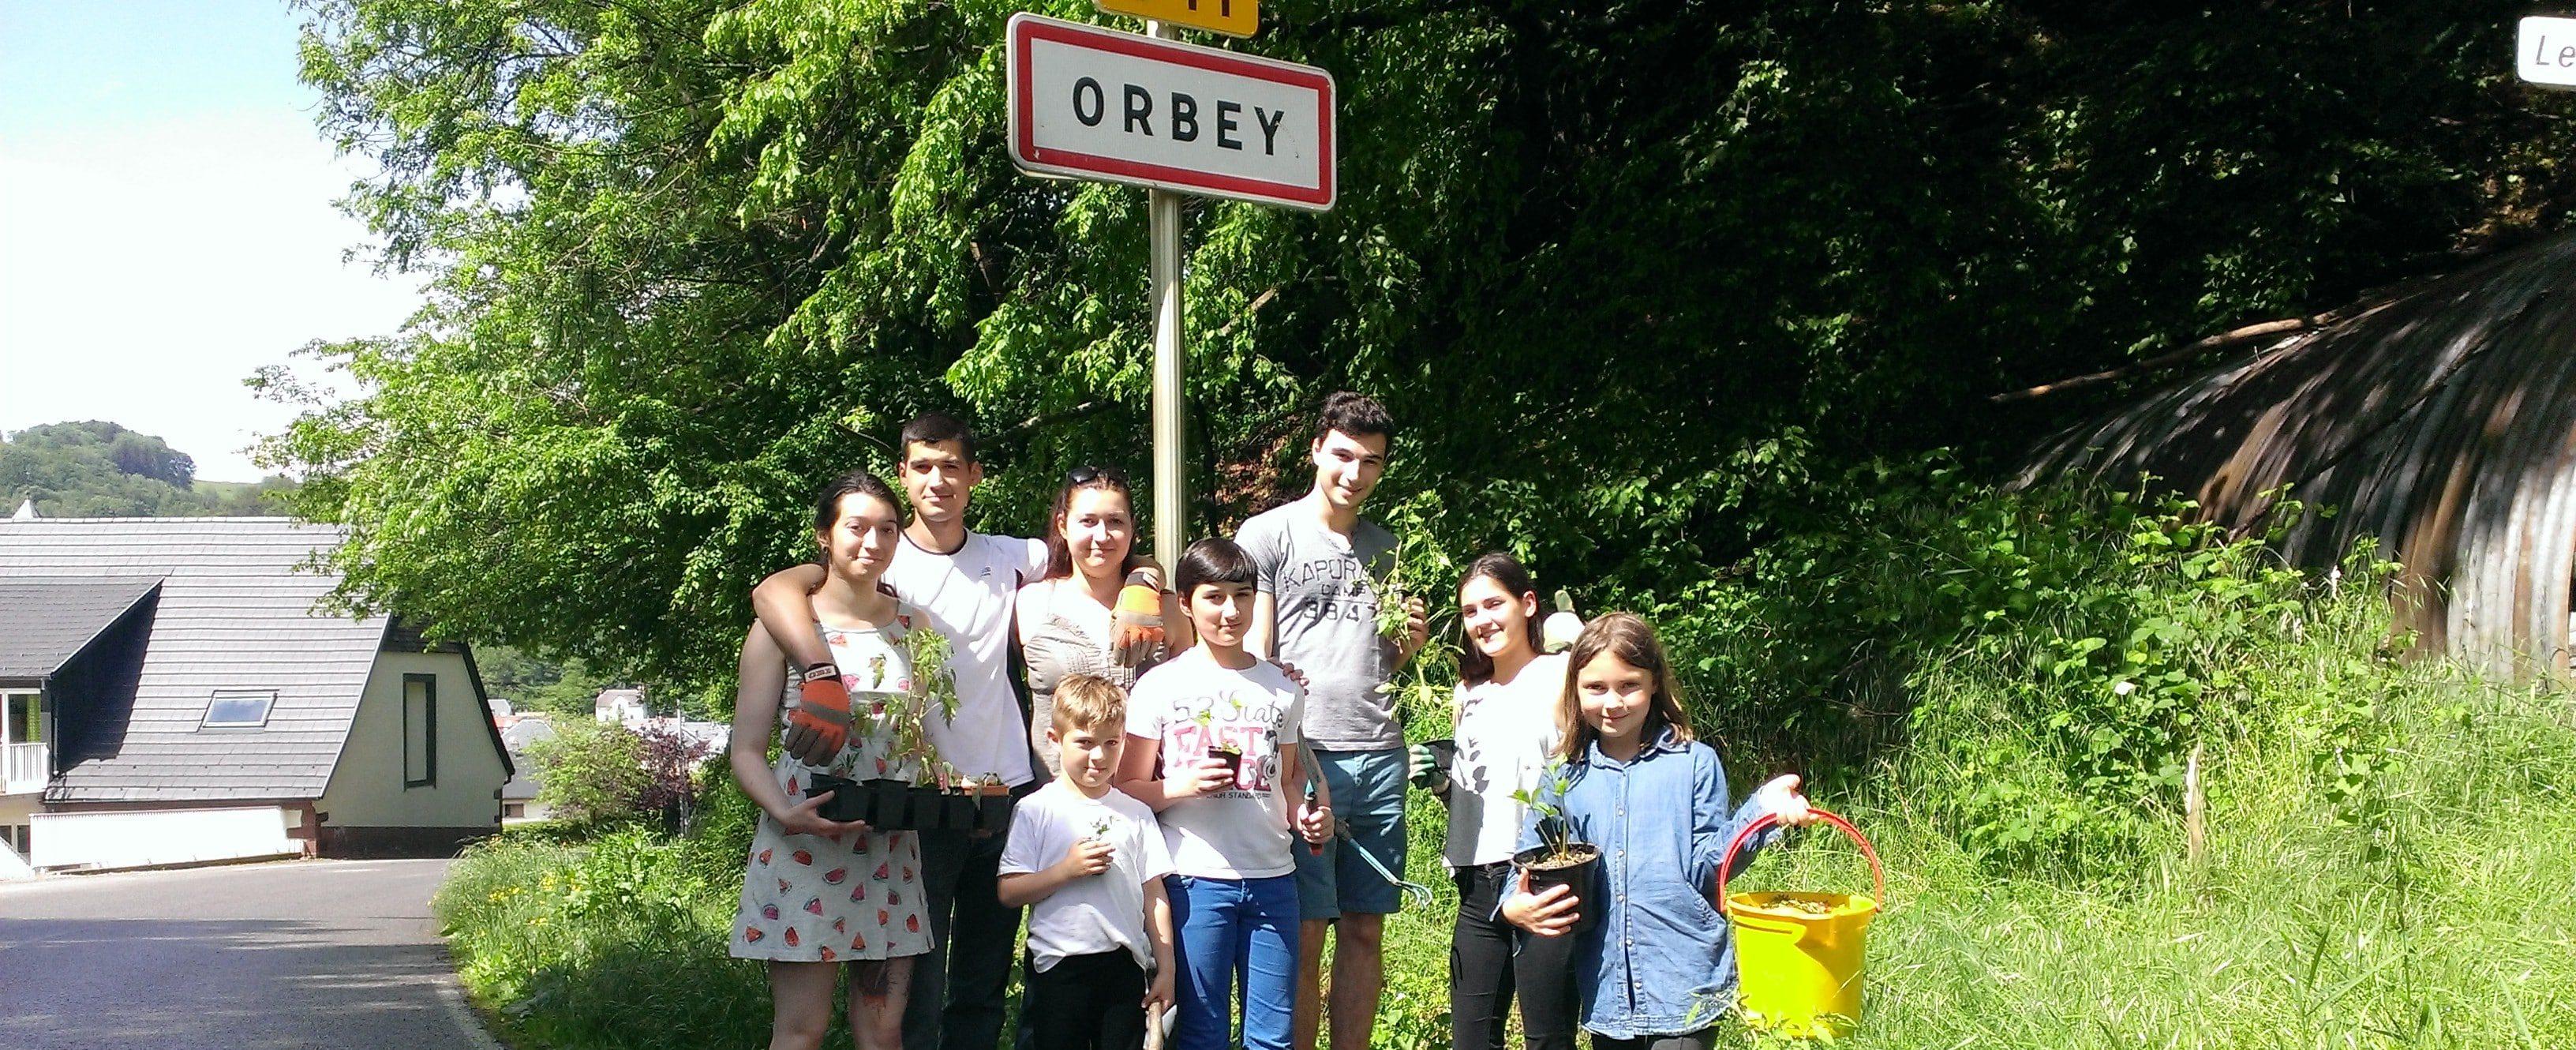 Groupe Panneau Orbey